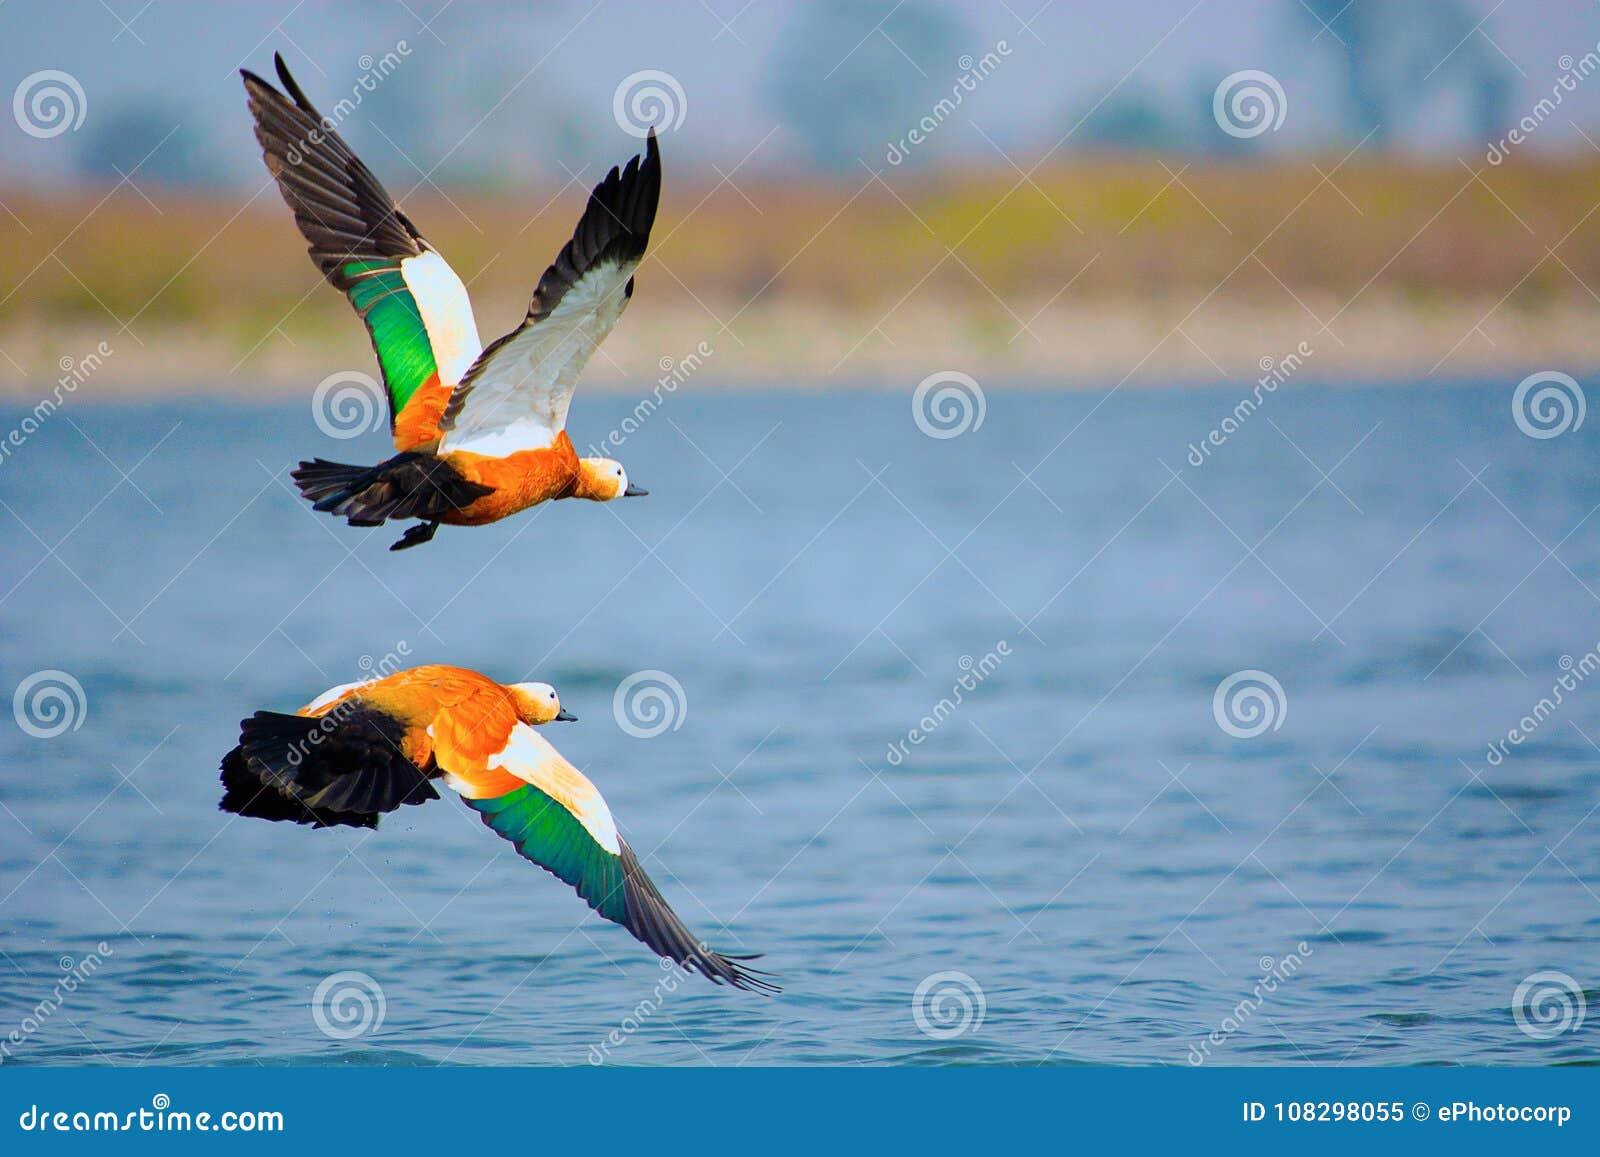 Ruddy shelduck, Tadorna ferruginea known in India as the Brahminy duck